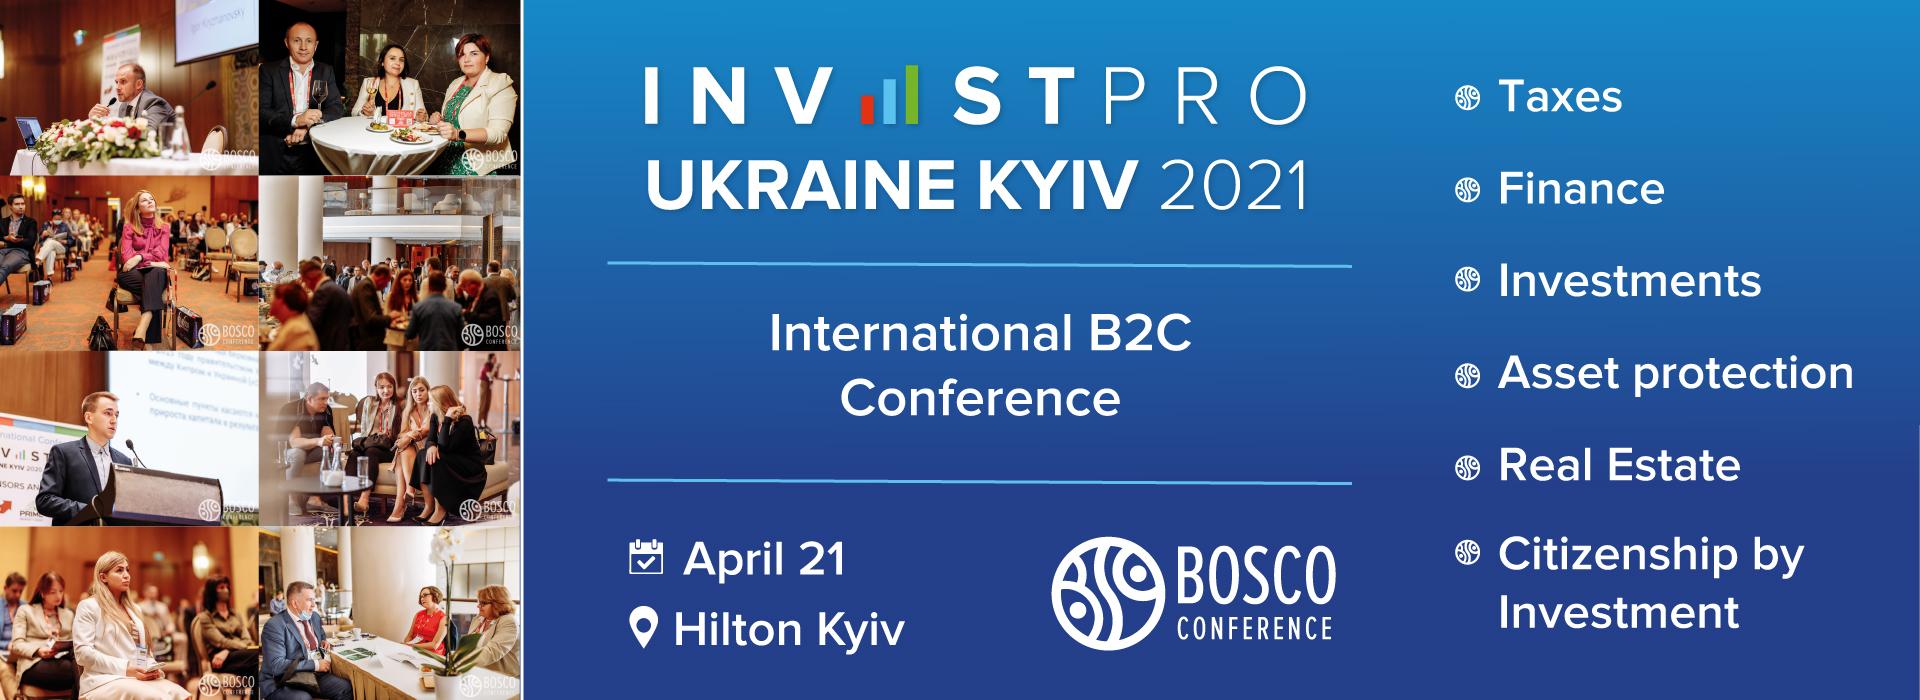 International conference InvestPro Ukraine Kyiv 2021